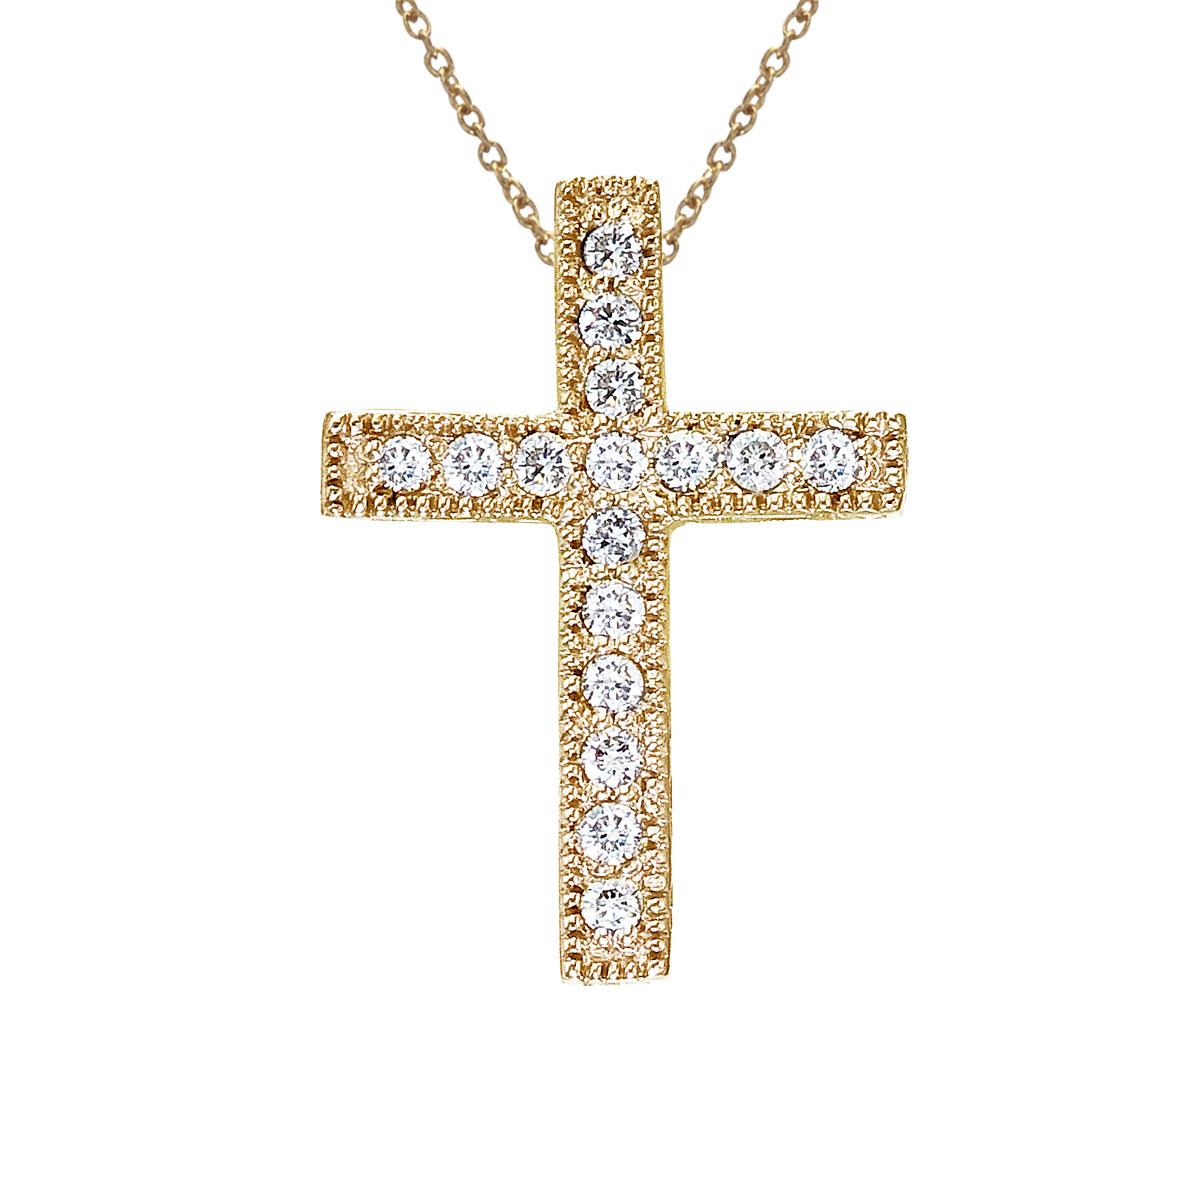 .16 ct diamond cross pendant set in 14k yellow gold.